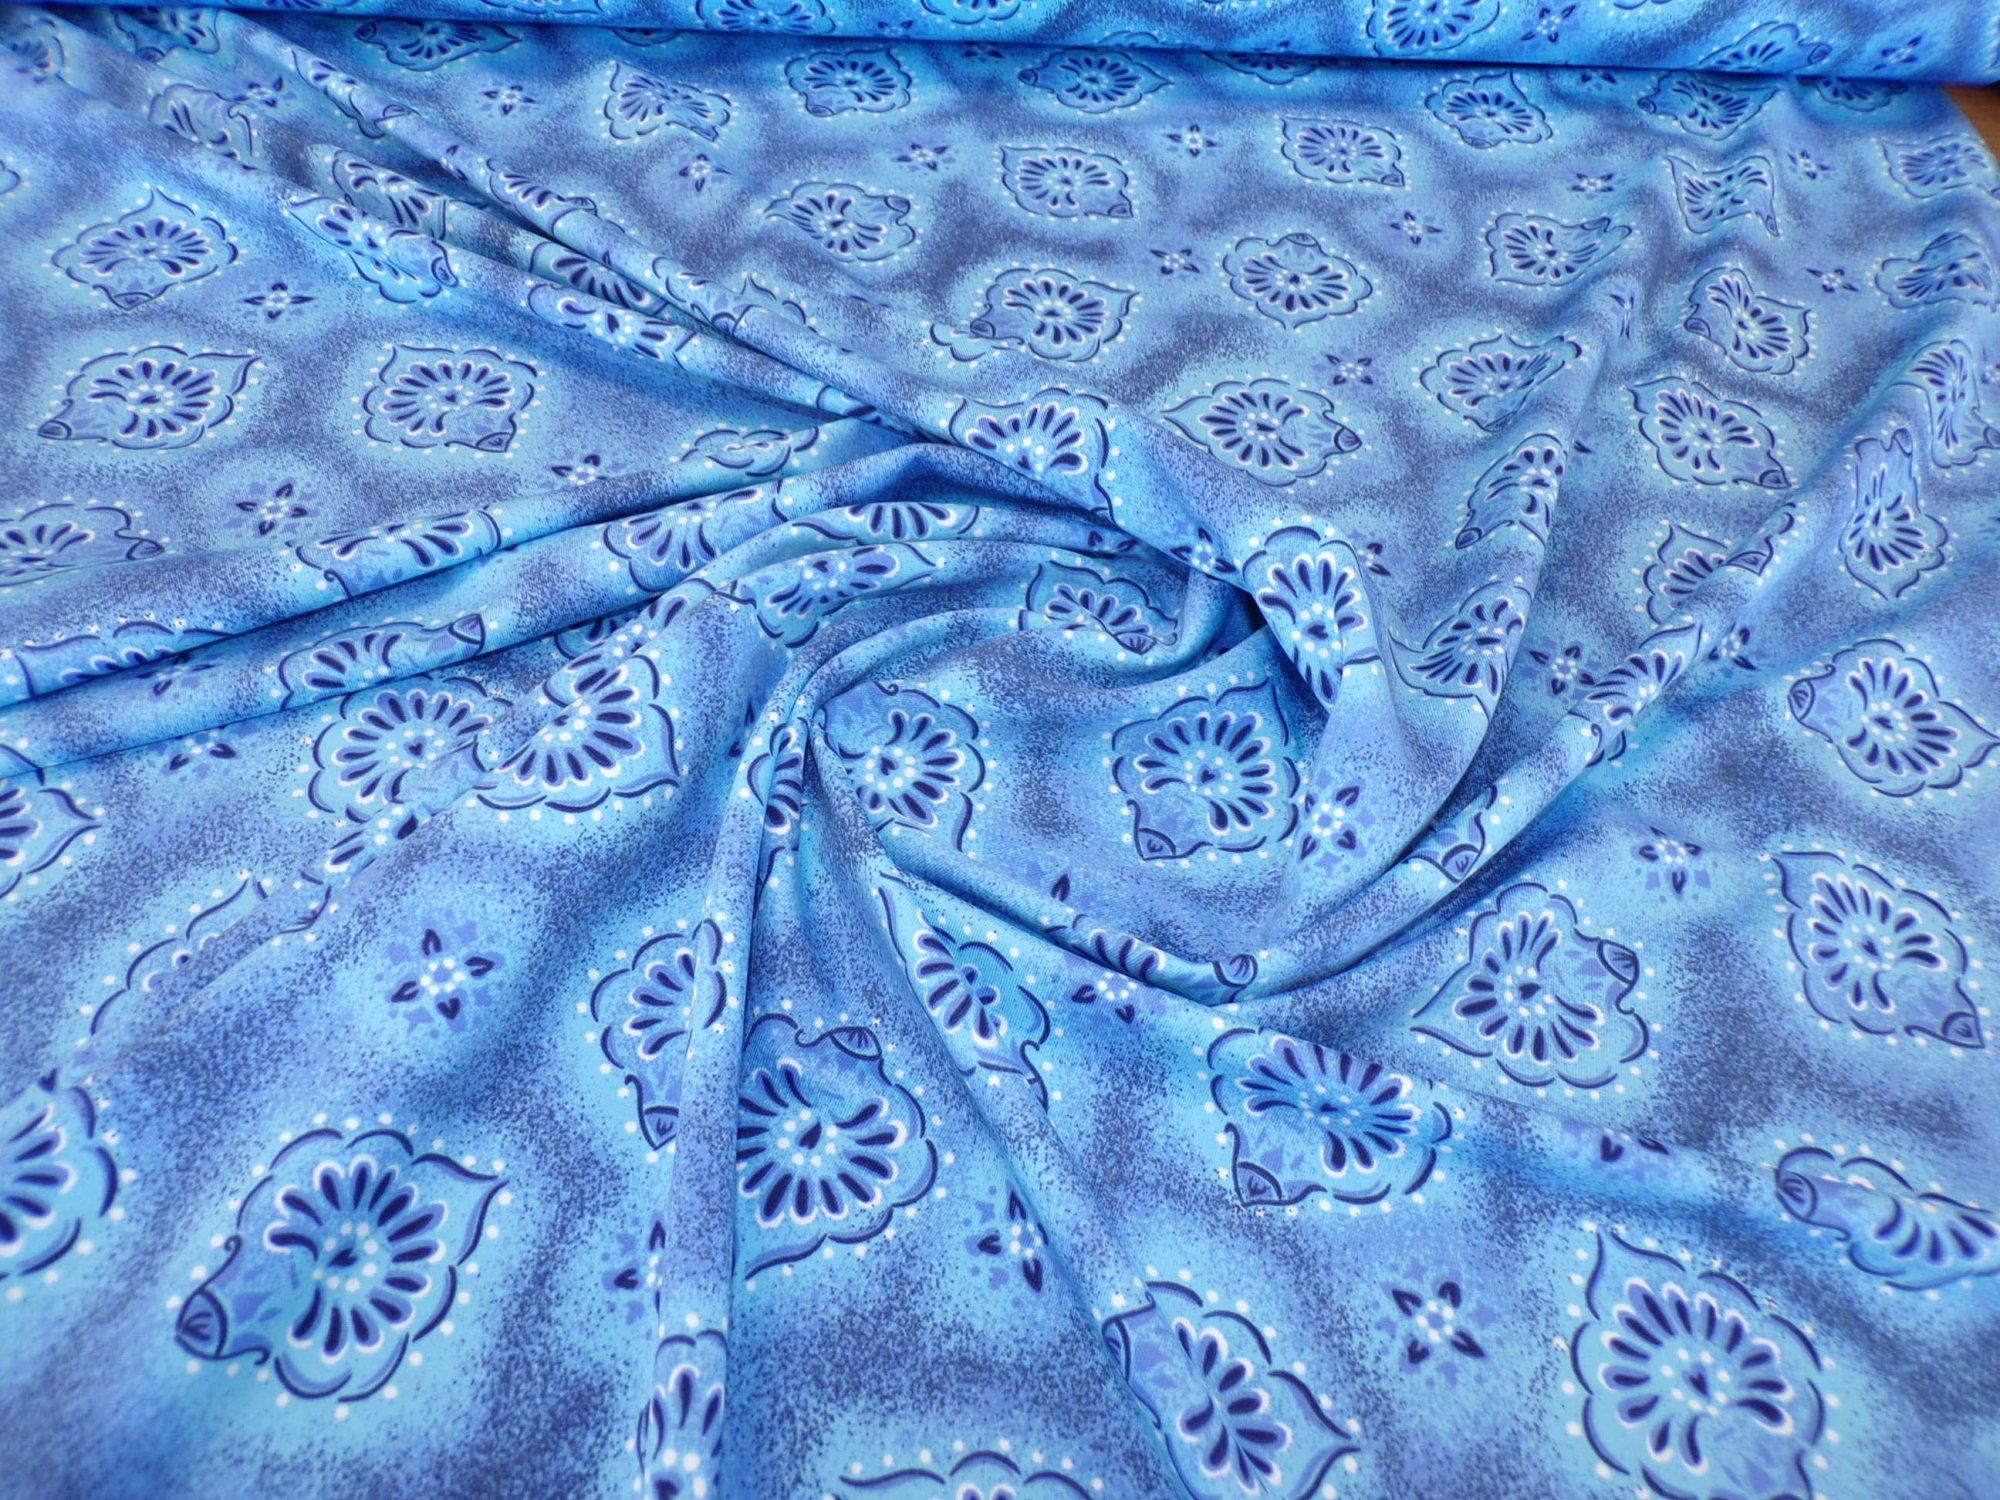 Nylon Lycra Swimwear - Light Blue Ornament Print